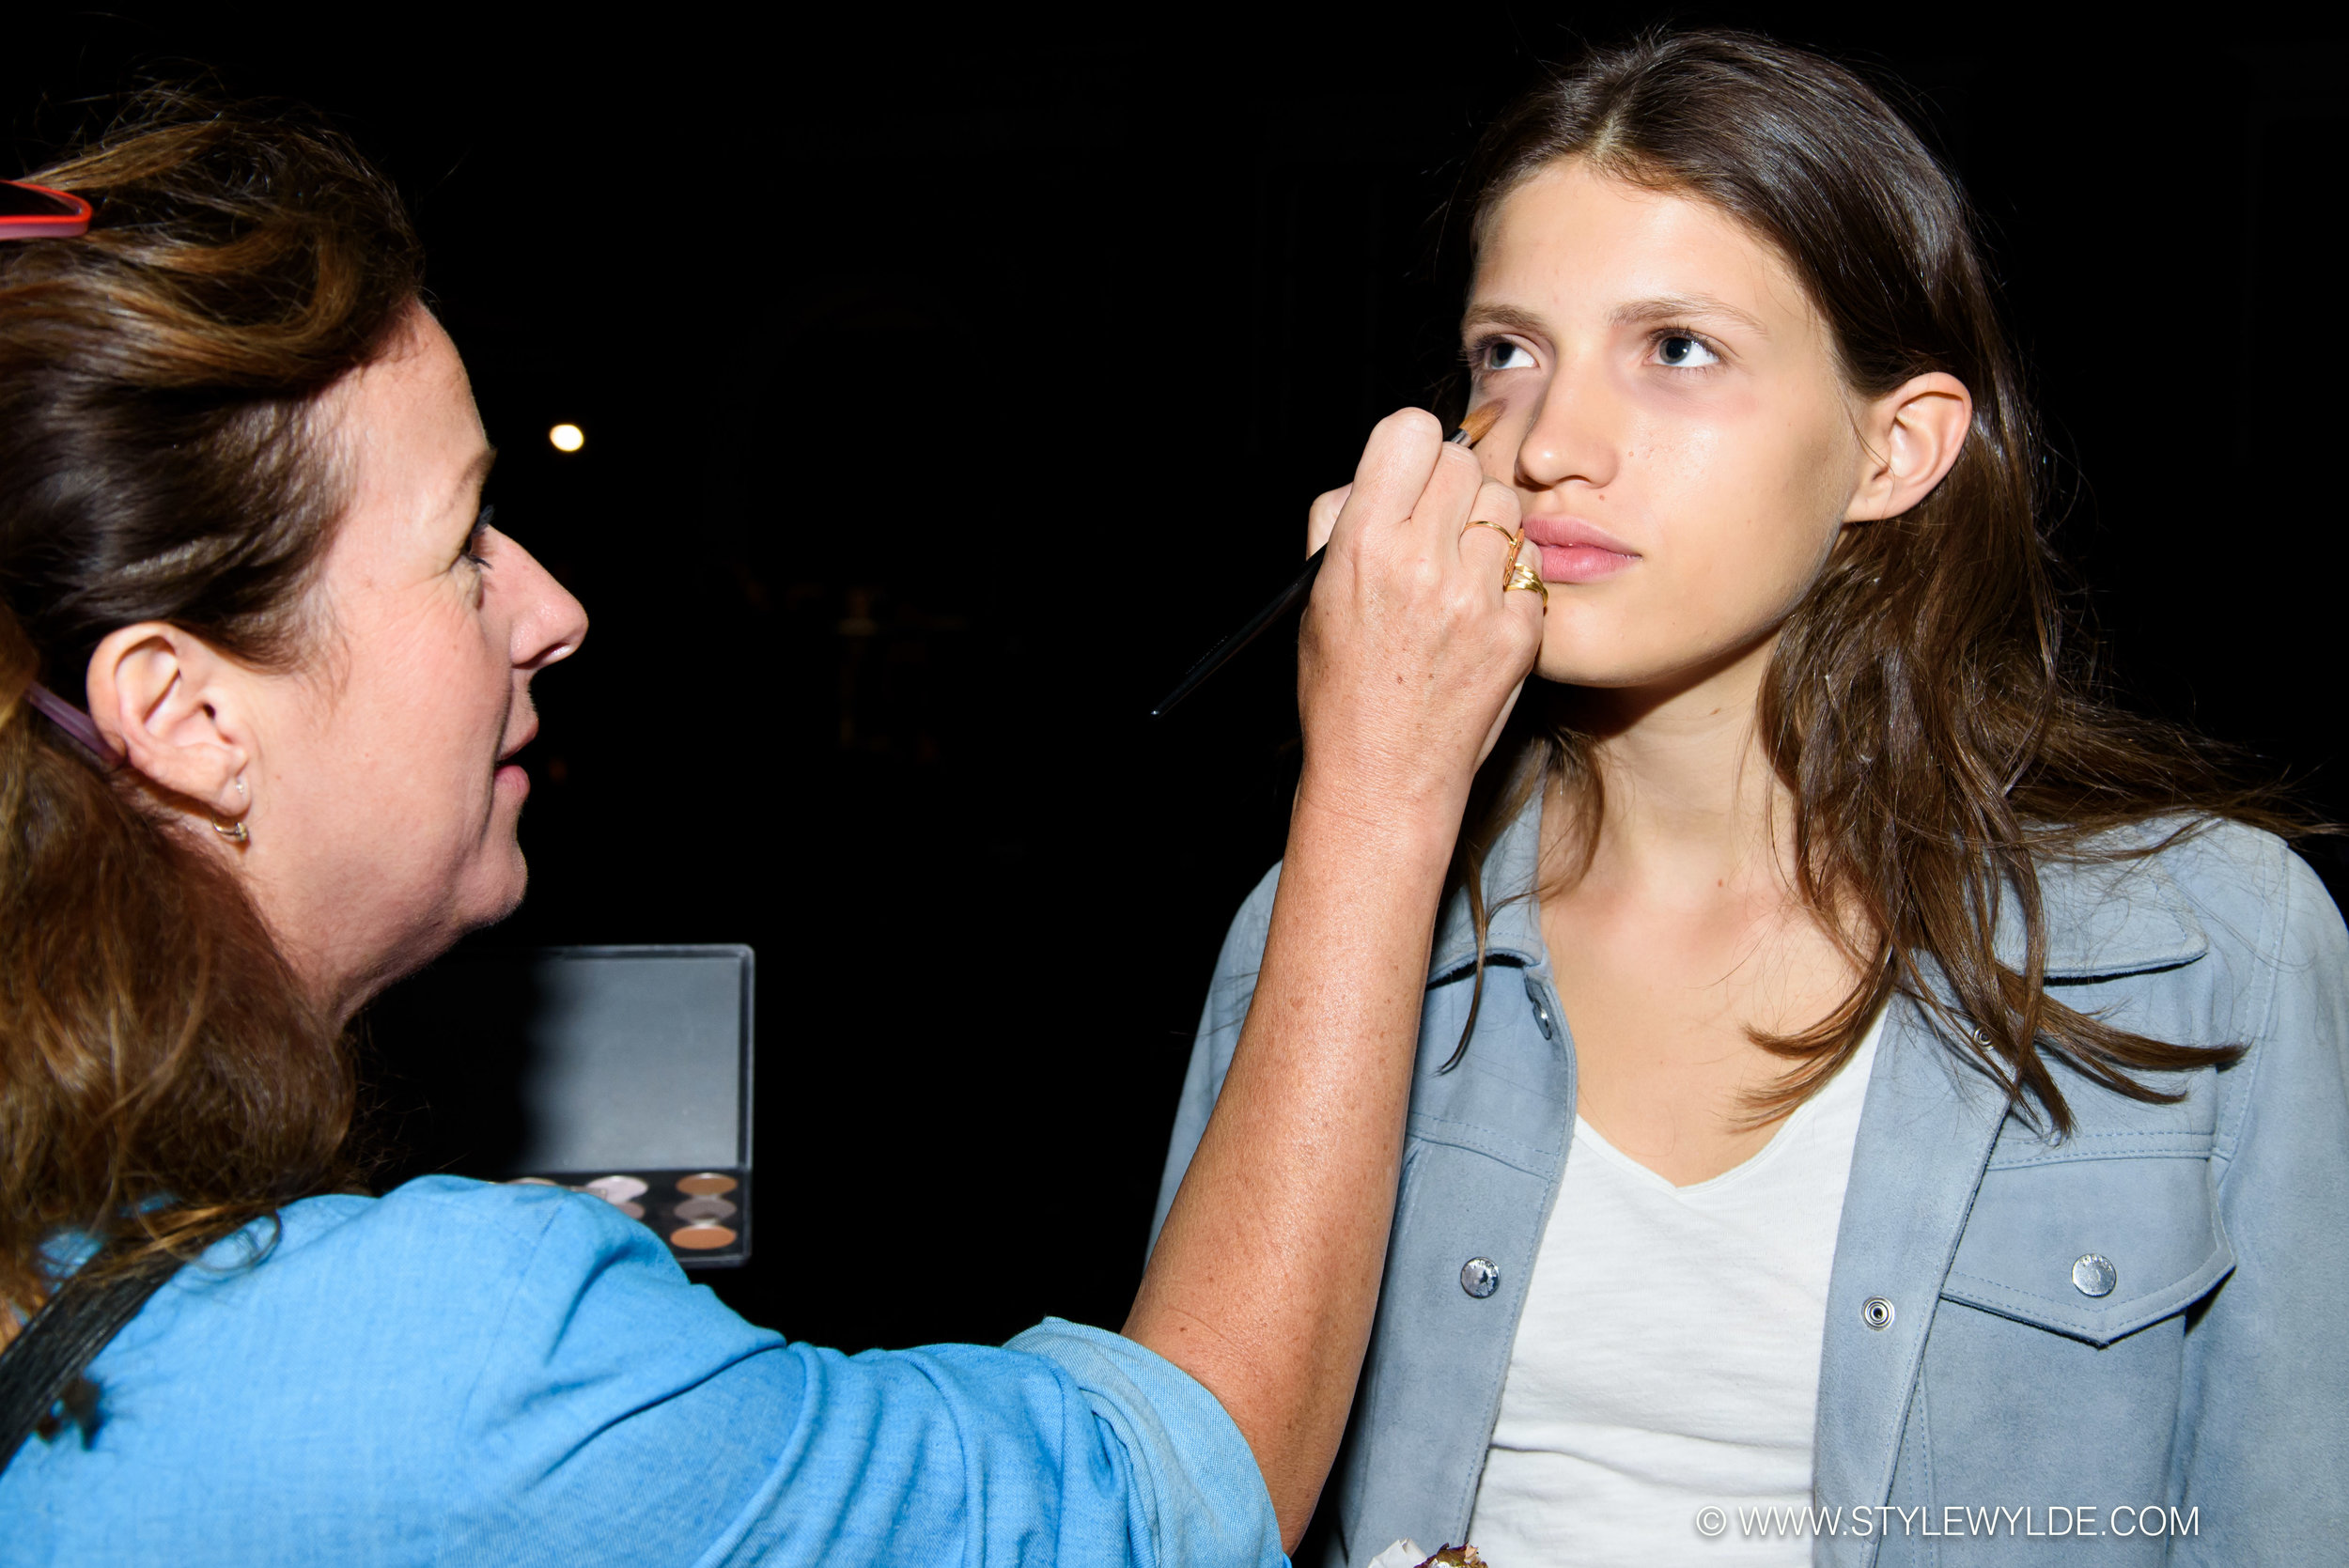 CynthiaHopeAnderson_Vibskov_SS18_Backstage Backstage_Eli-7.jpg